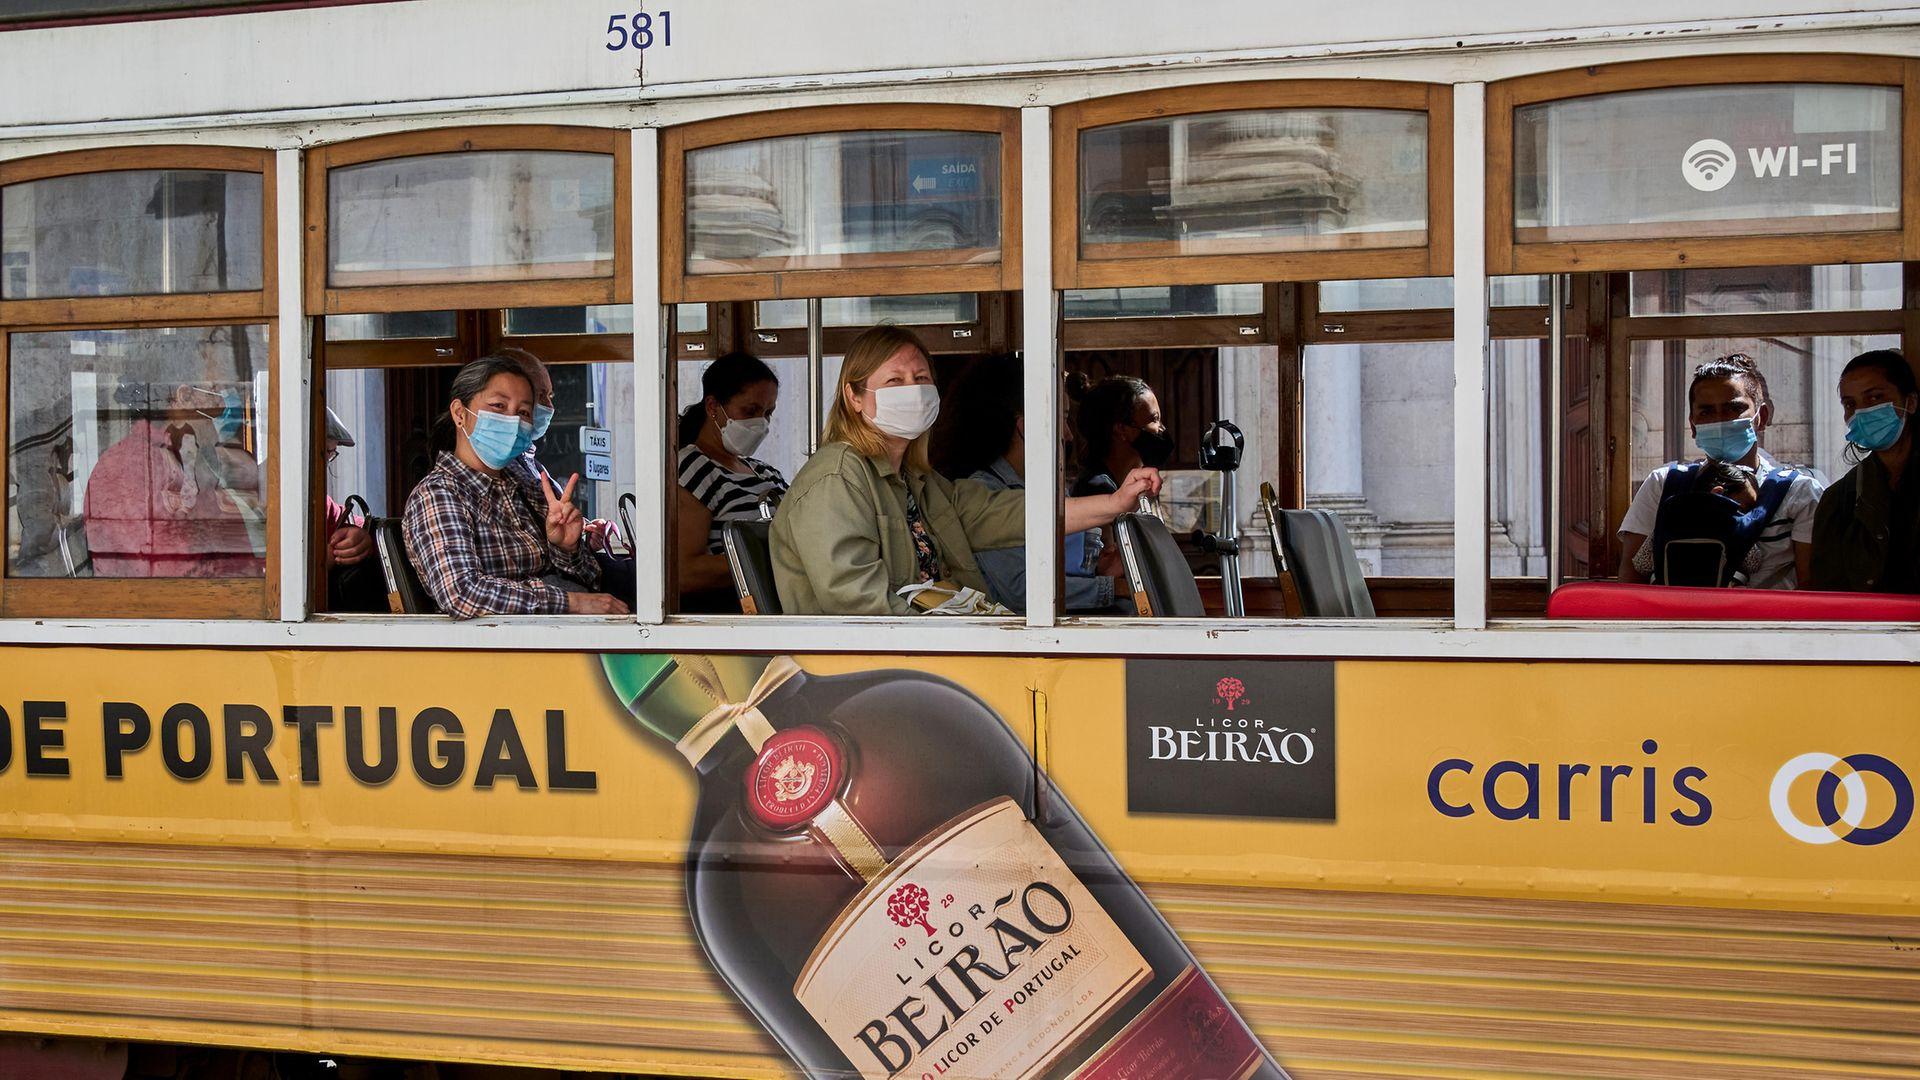 Mask-clad passengers ride a tram during the COVID-19 Coronavirus pandemic in Lisbon, April 2021  Photo by Horacio Villalobos/Corbis via Getty Images - Credit: Photo by Horacio Villalobos/Corbis via Getty Images